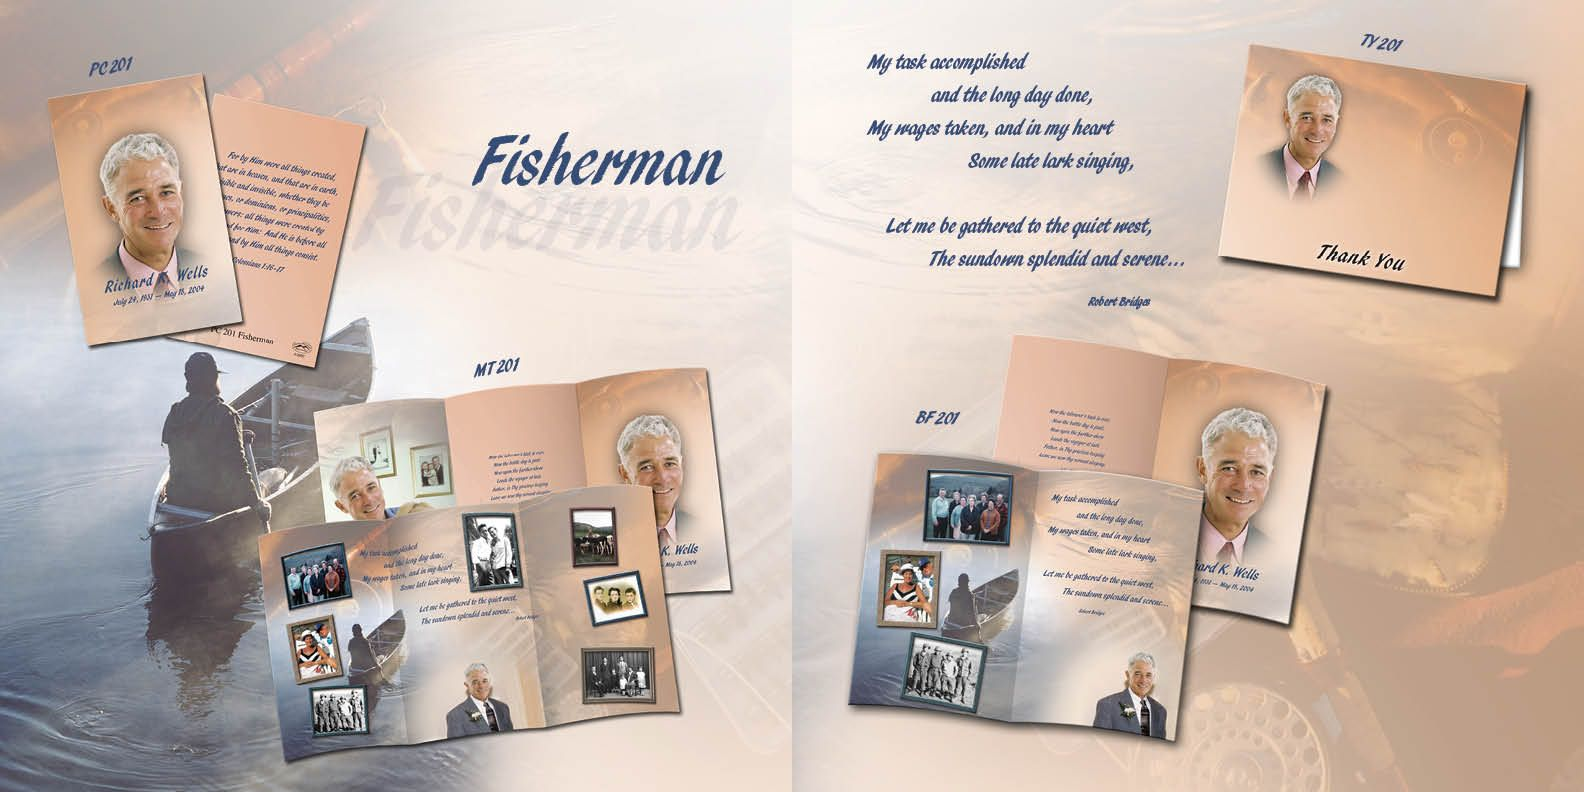 201 Fisherman